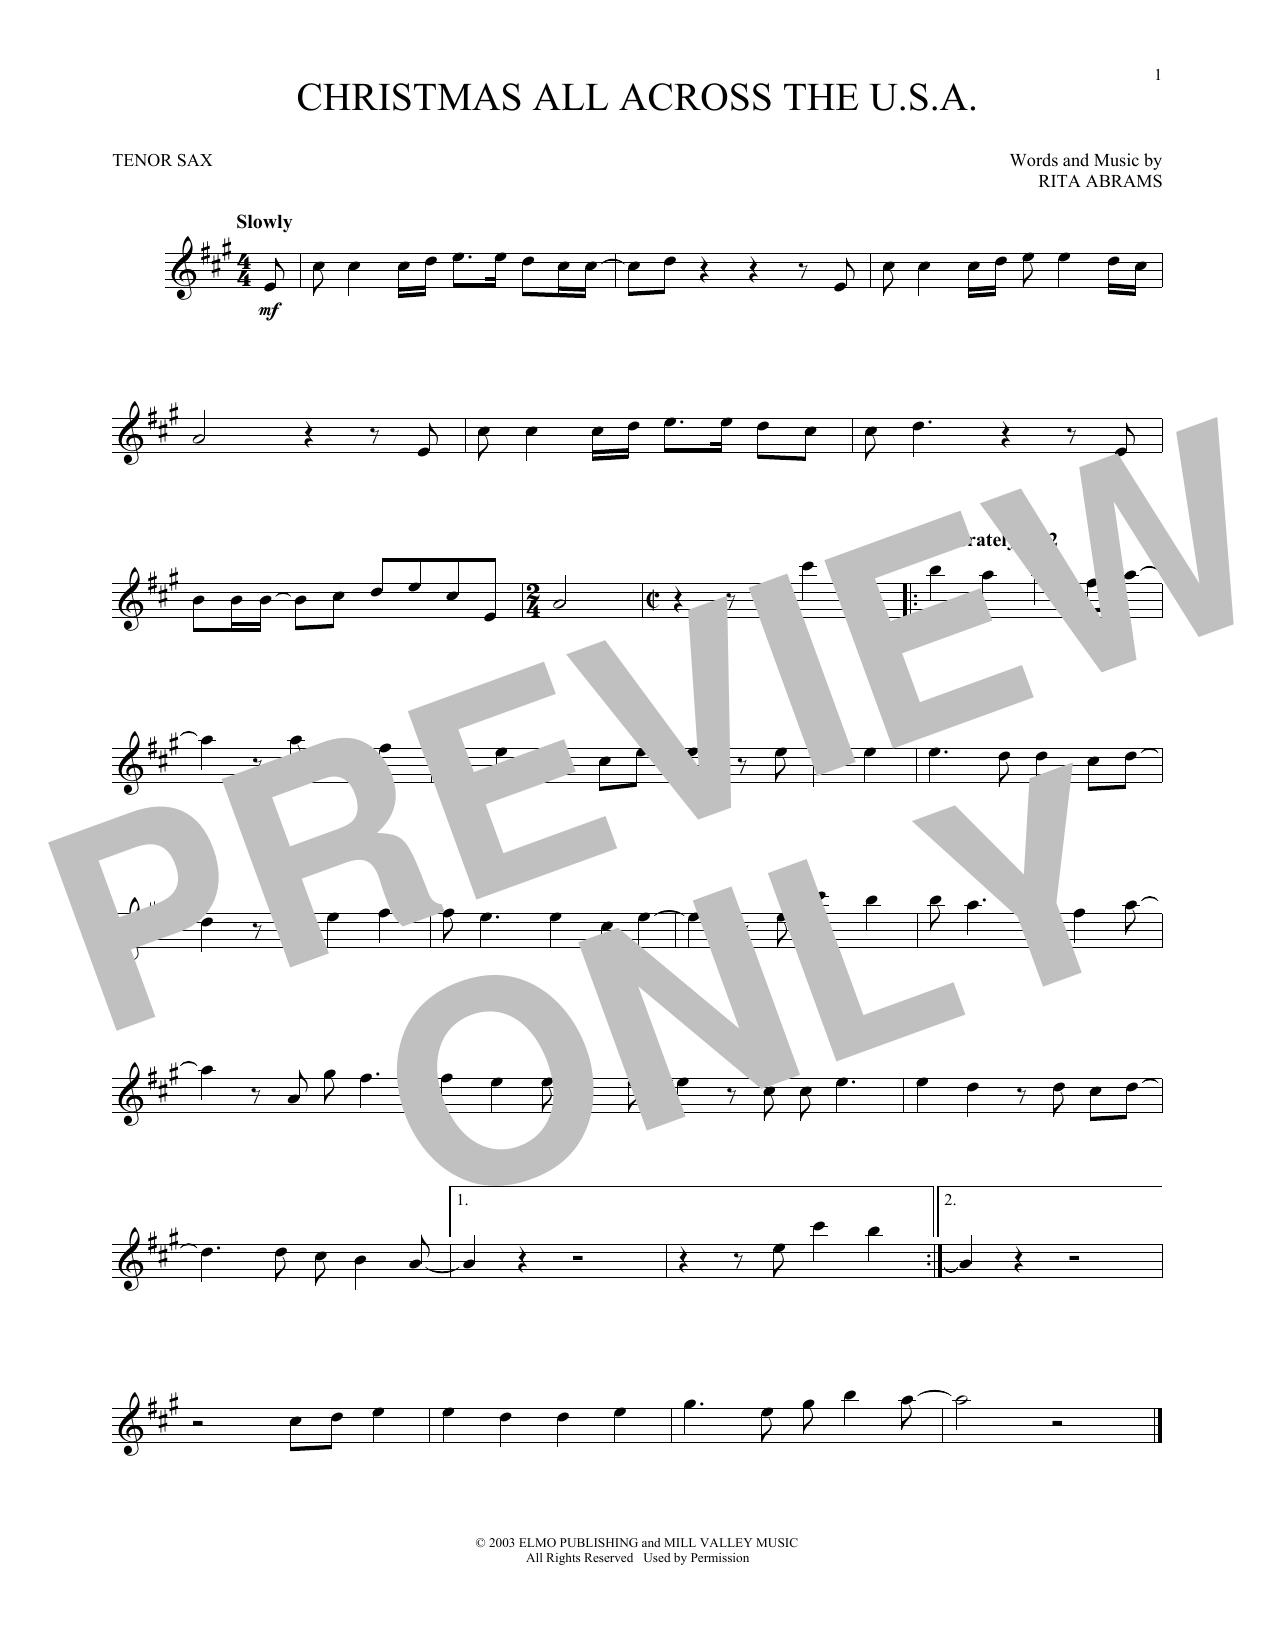 Christmas All Across The U.S.A. (Tenor Sax Solo)